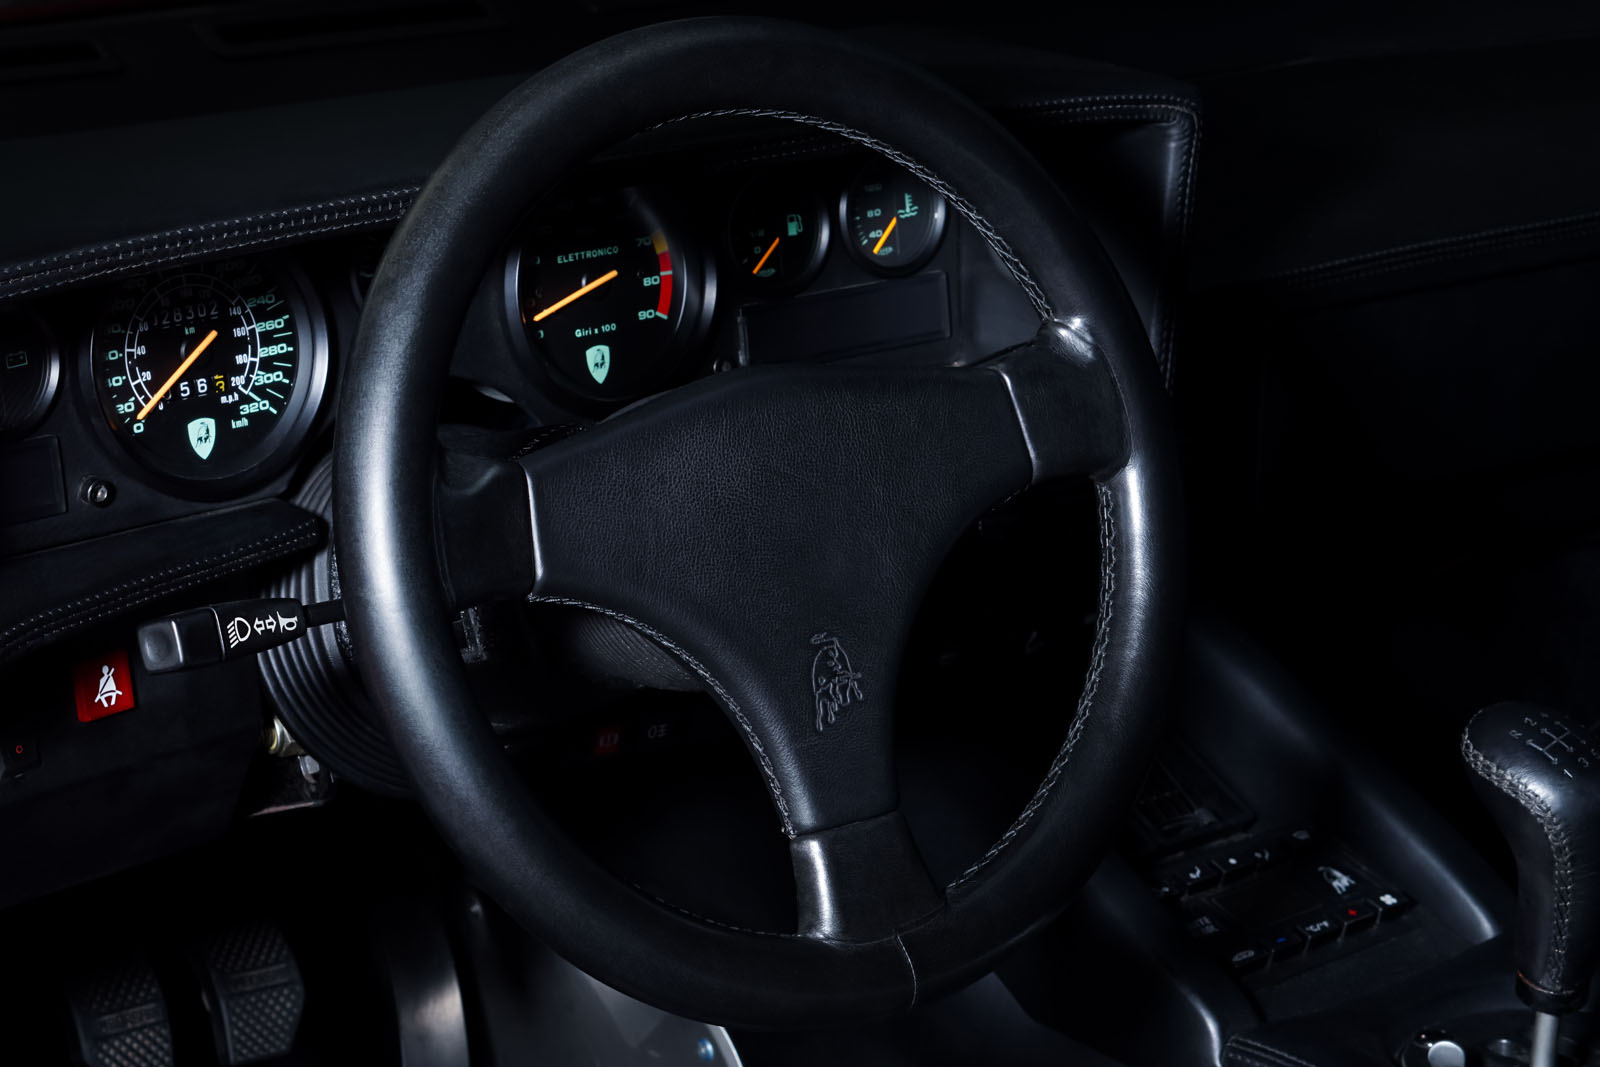 Lamborghini_Countach_Rot_Schwarz_LAM-2811_11_w